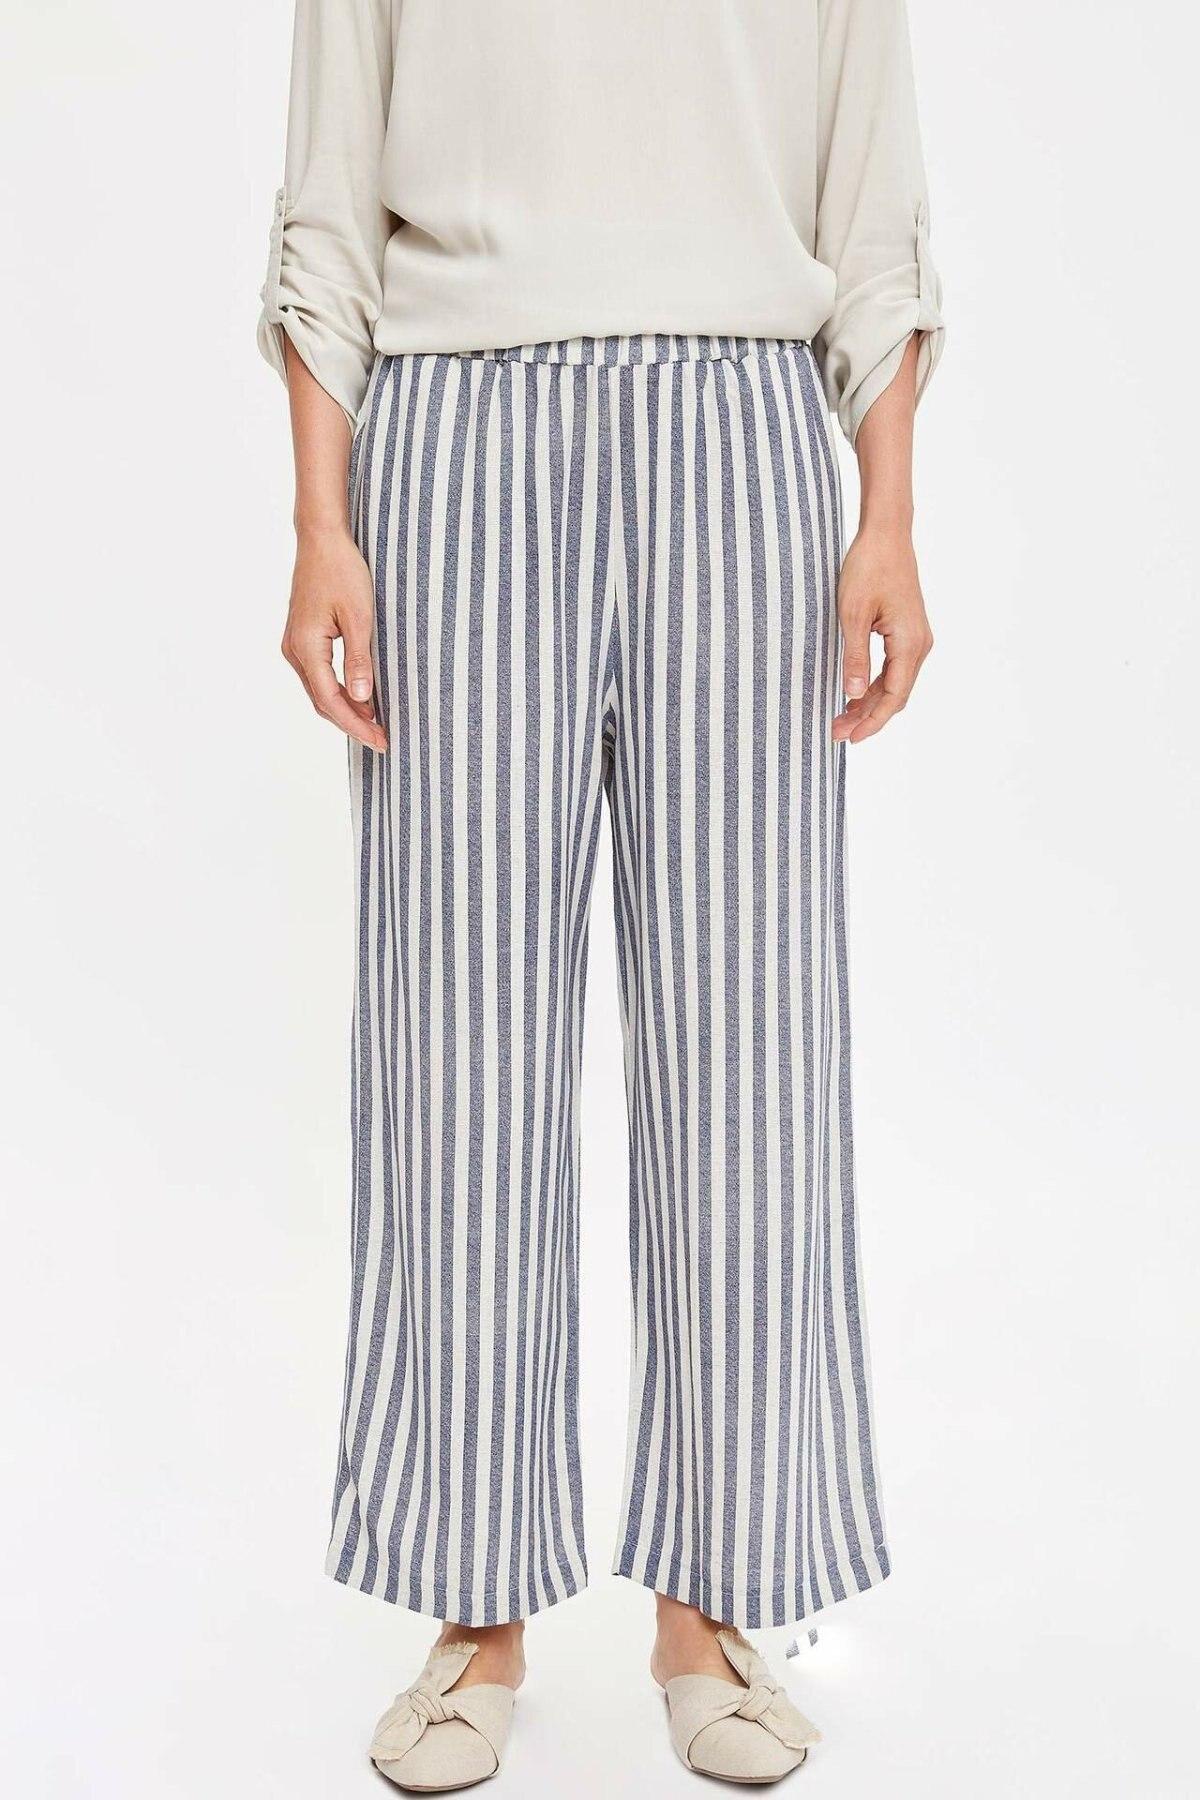 DeFacto Women Fashion Trousers Female Casual Comfort Pants High Qualilty Striped Loose Wide Leg Pant Ladies -M0402AZ19SM